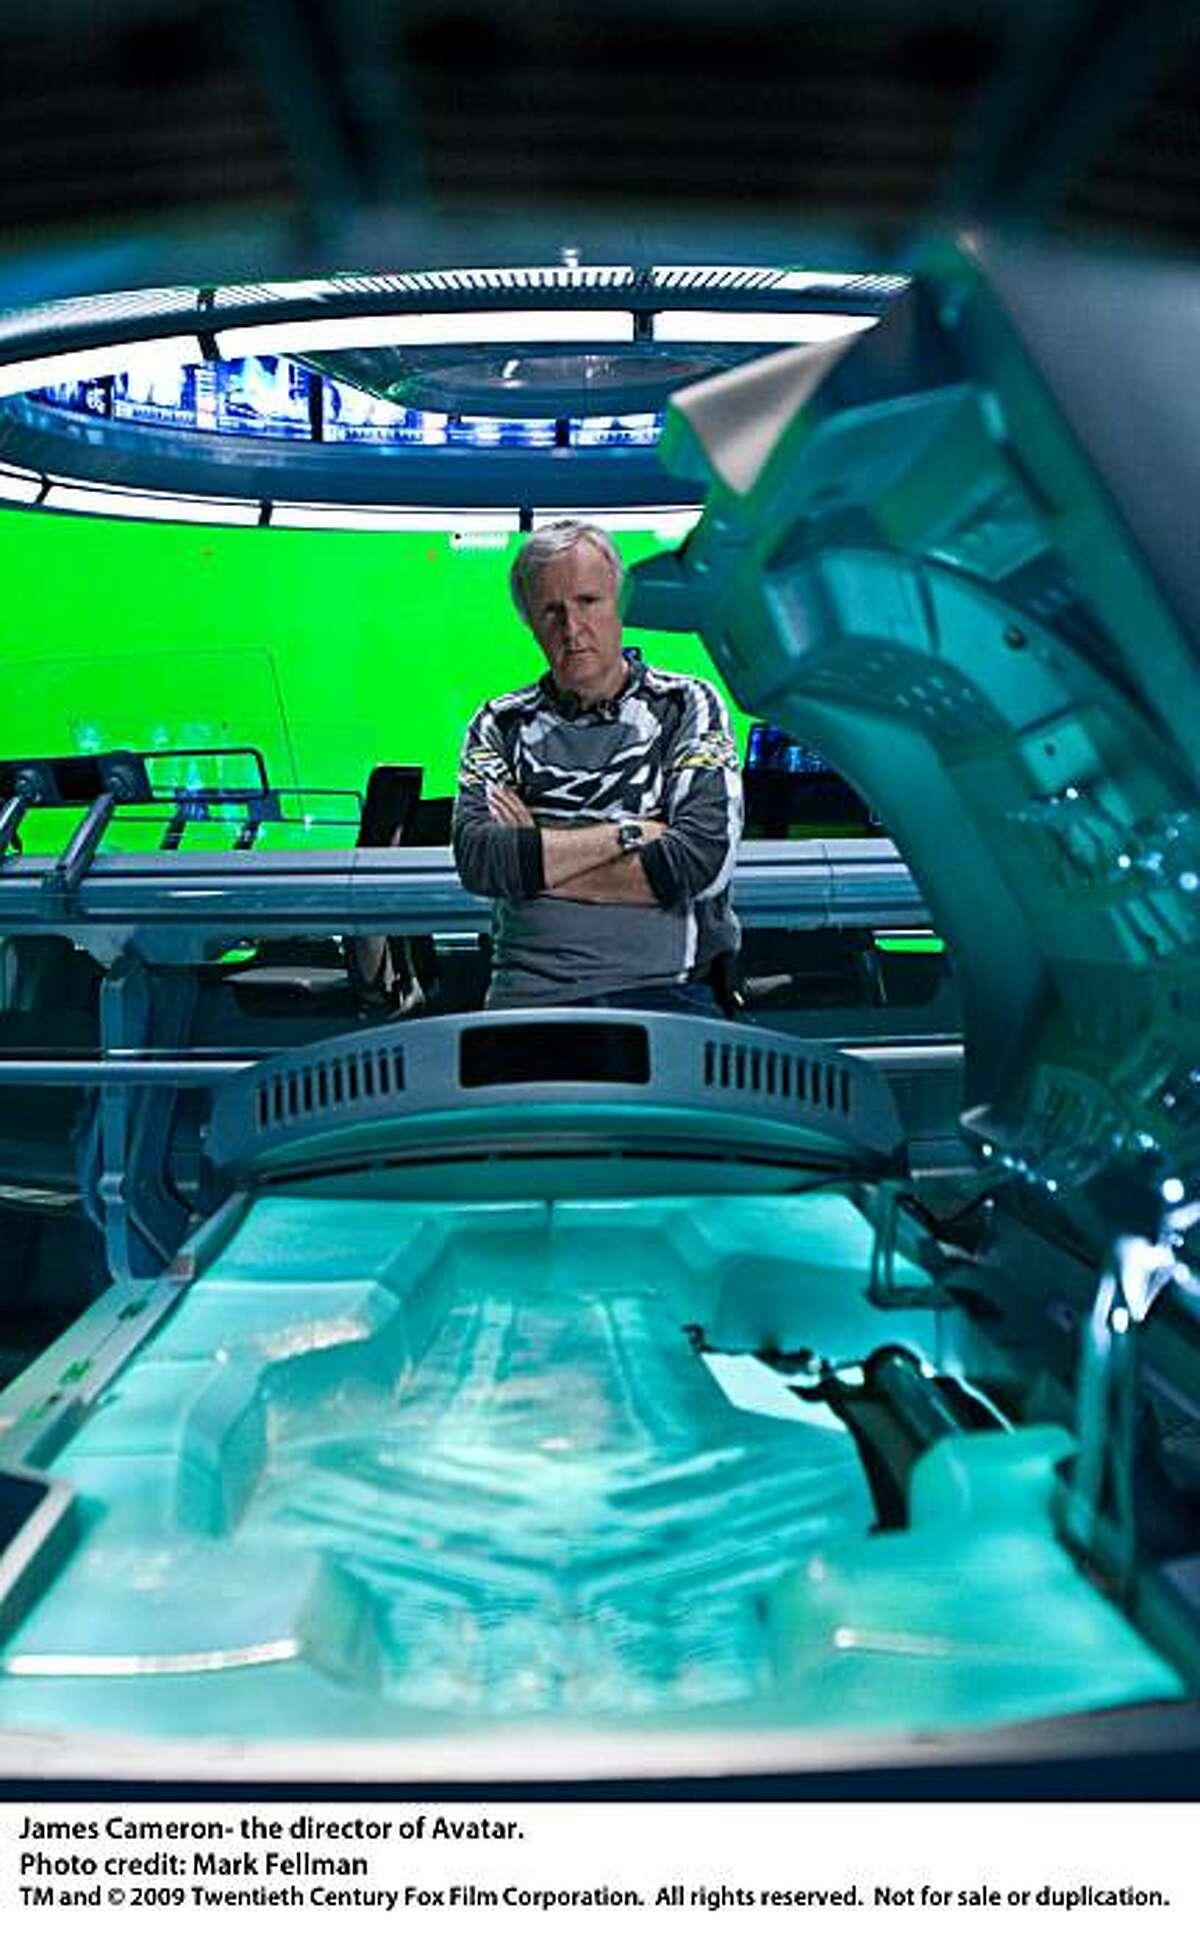 James Cameron, director of